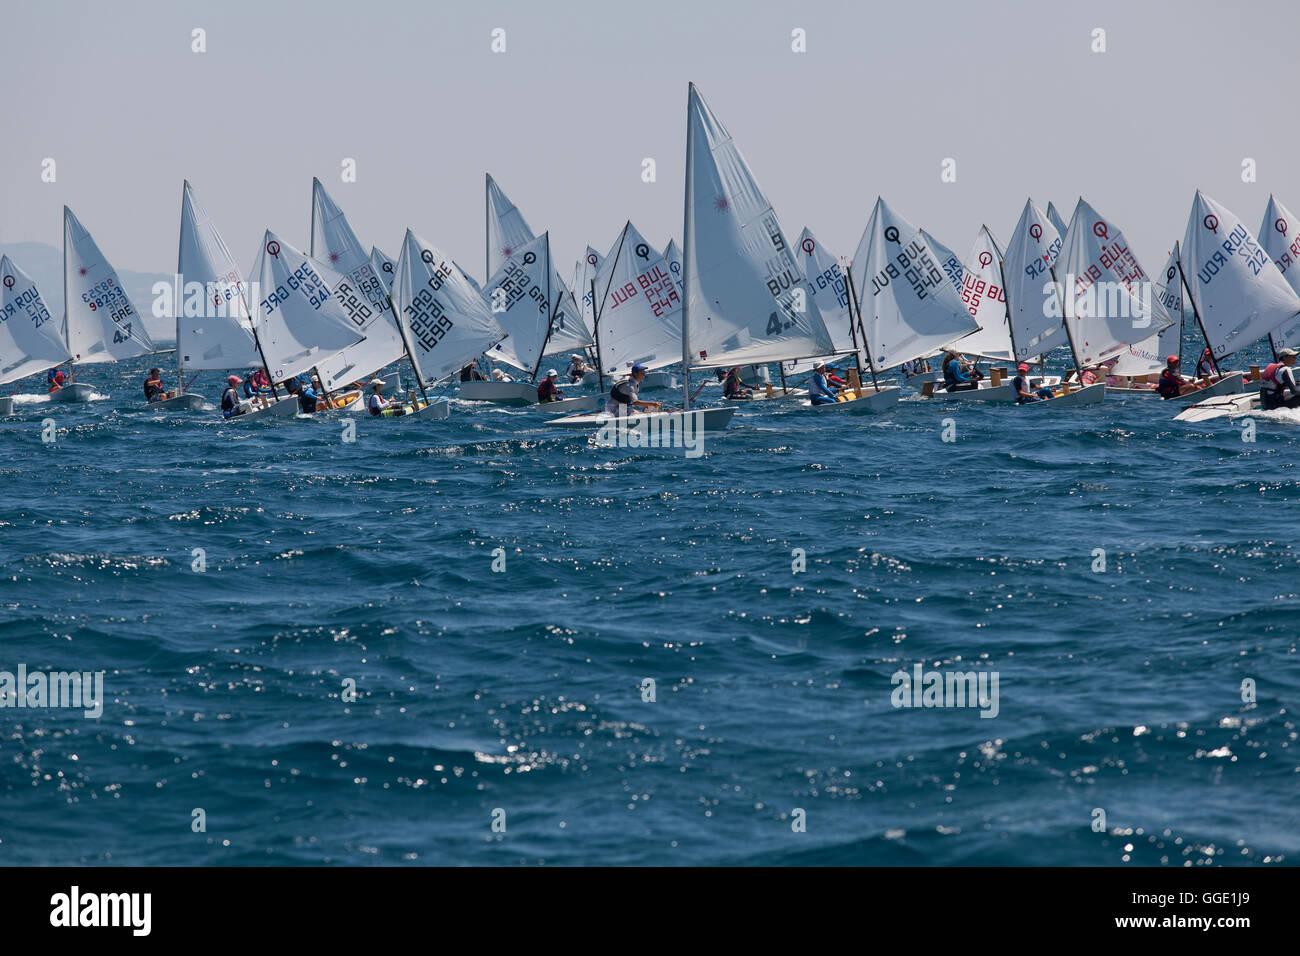 ALEXANDROUPOLI, GREECE - JULY 21: An unidentified sailing athletes at International Summer Regatta sailing action - Stock Image